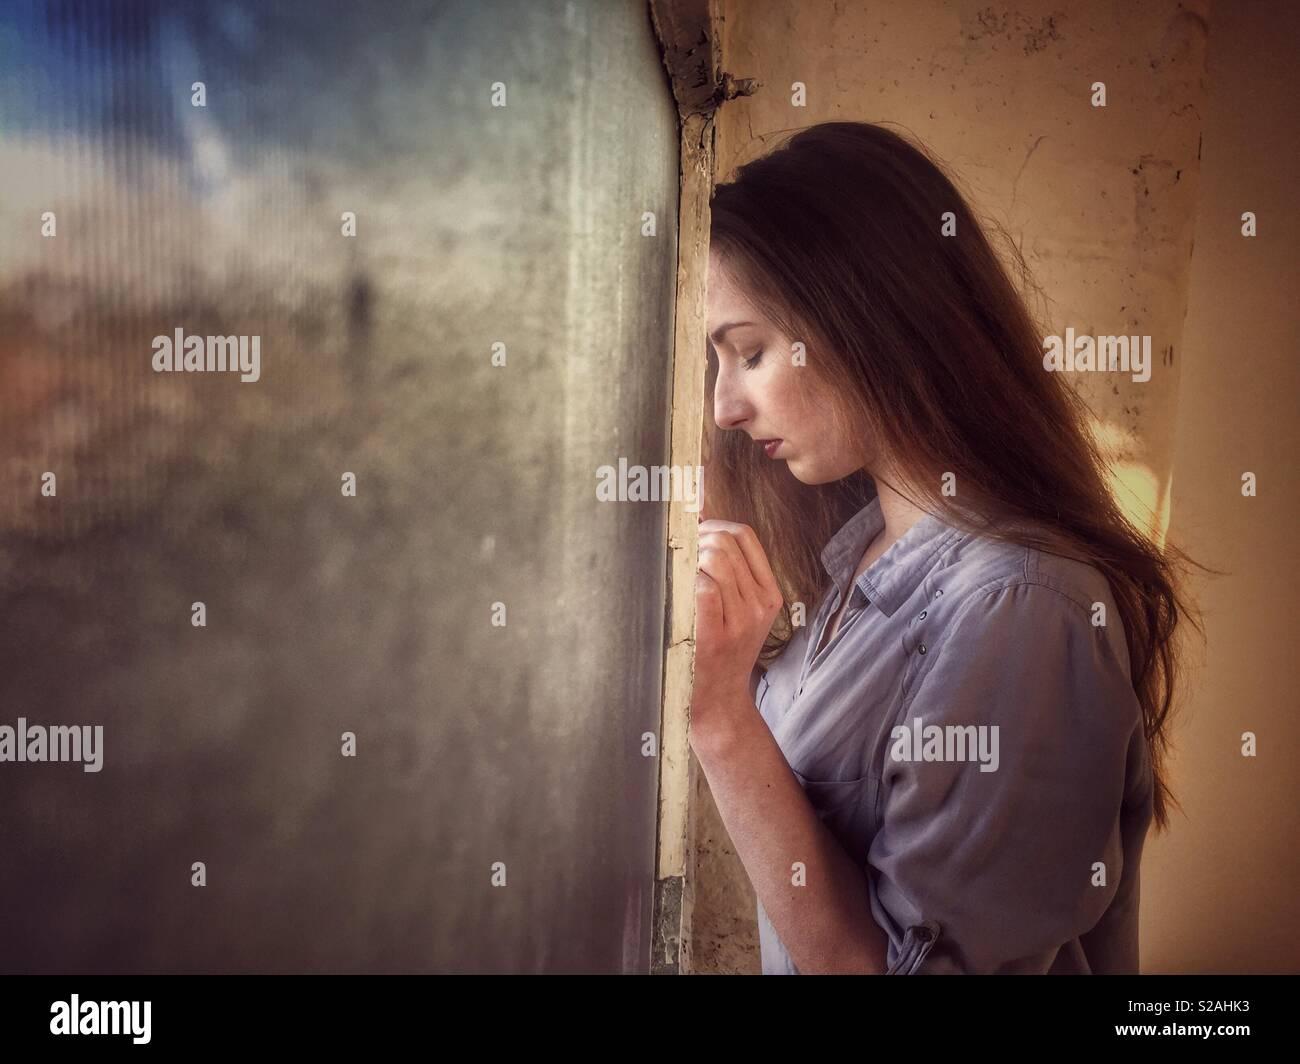 Traurige Frau lehnte sich gegen das Fenster Stockbild